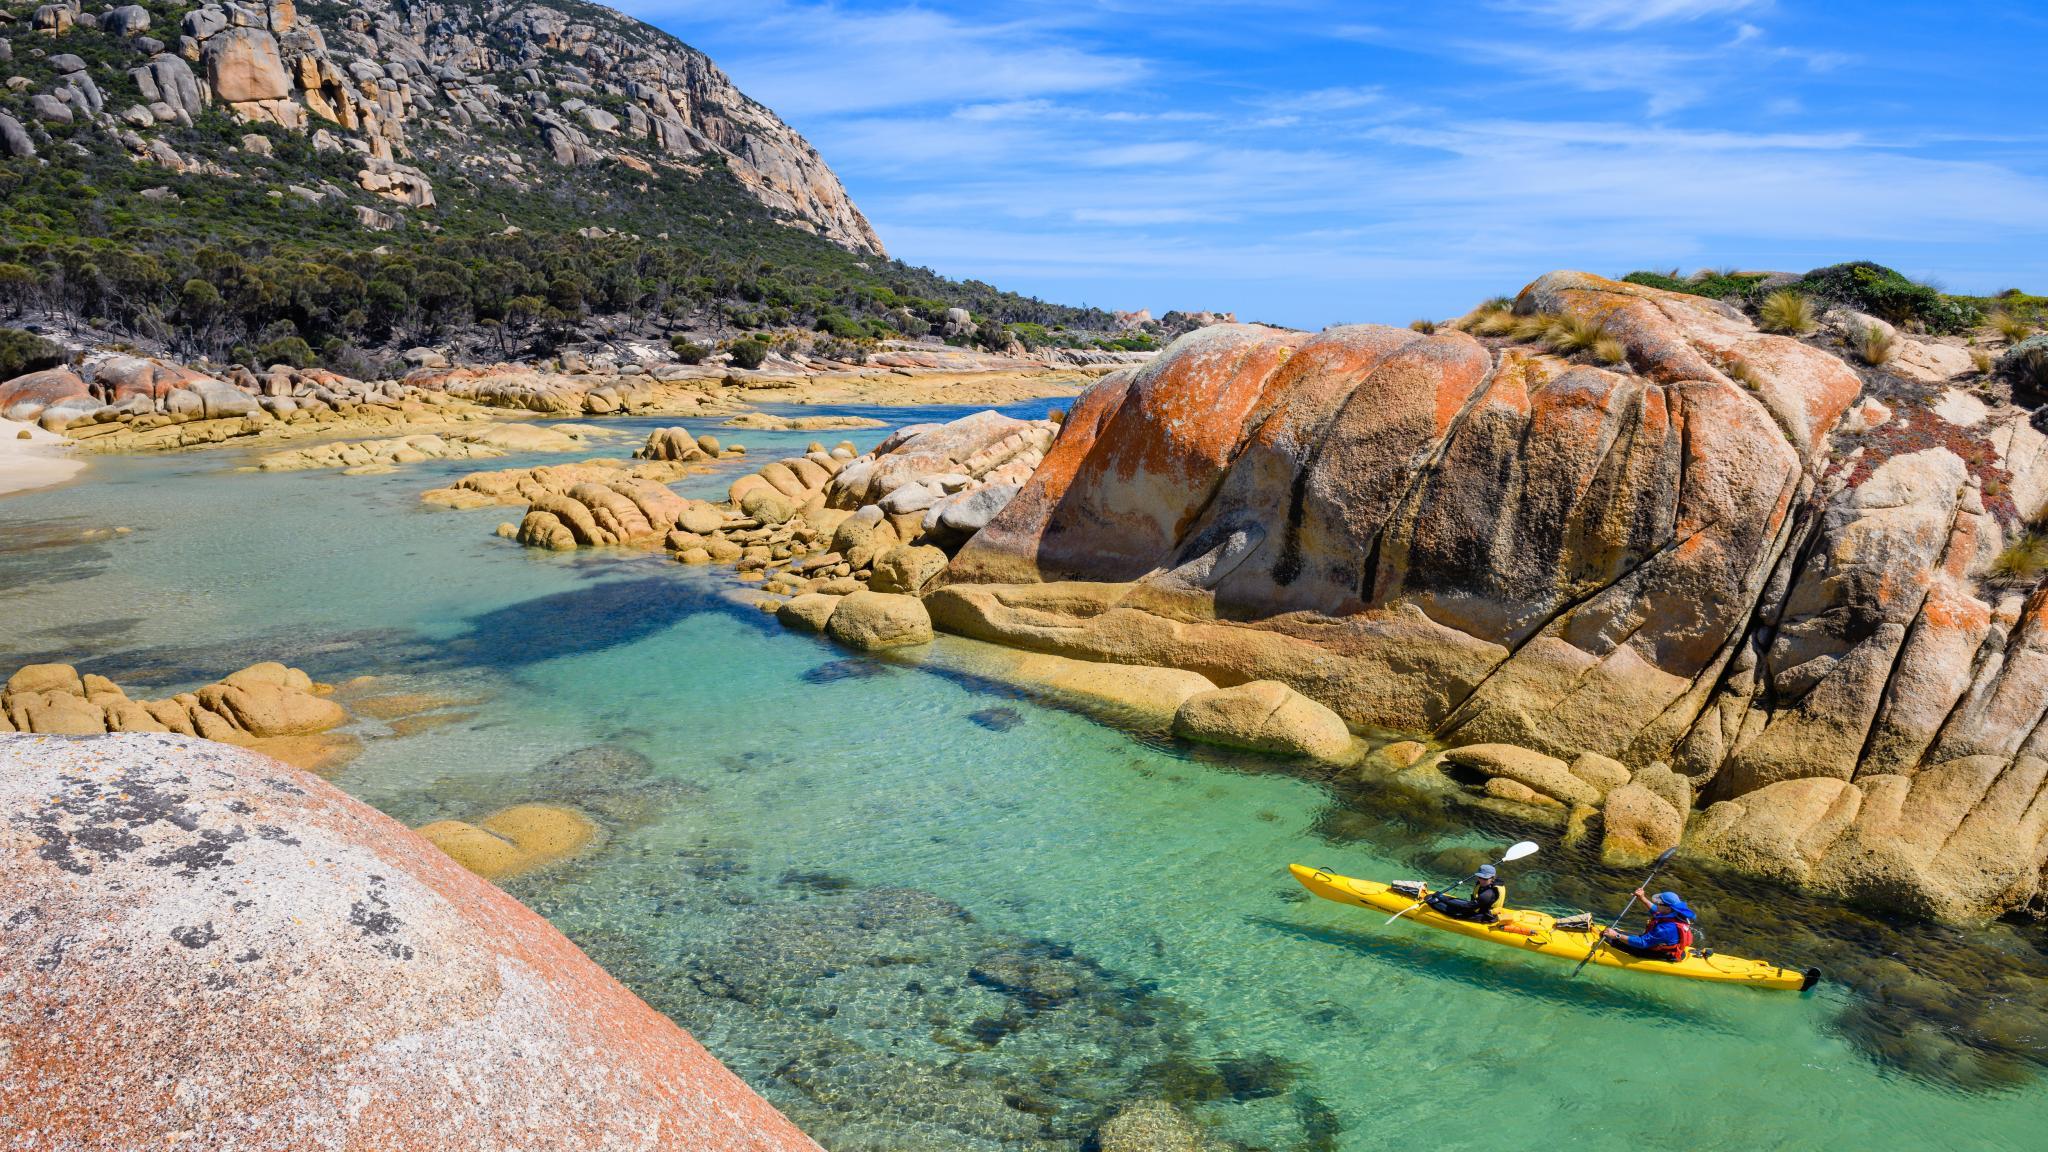 Roaring 40s Kayaking - Kayakers on a multi day tour on Flinders Island Tasmania